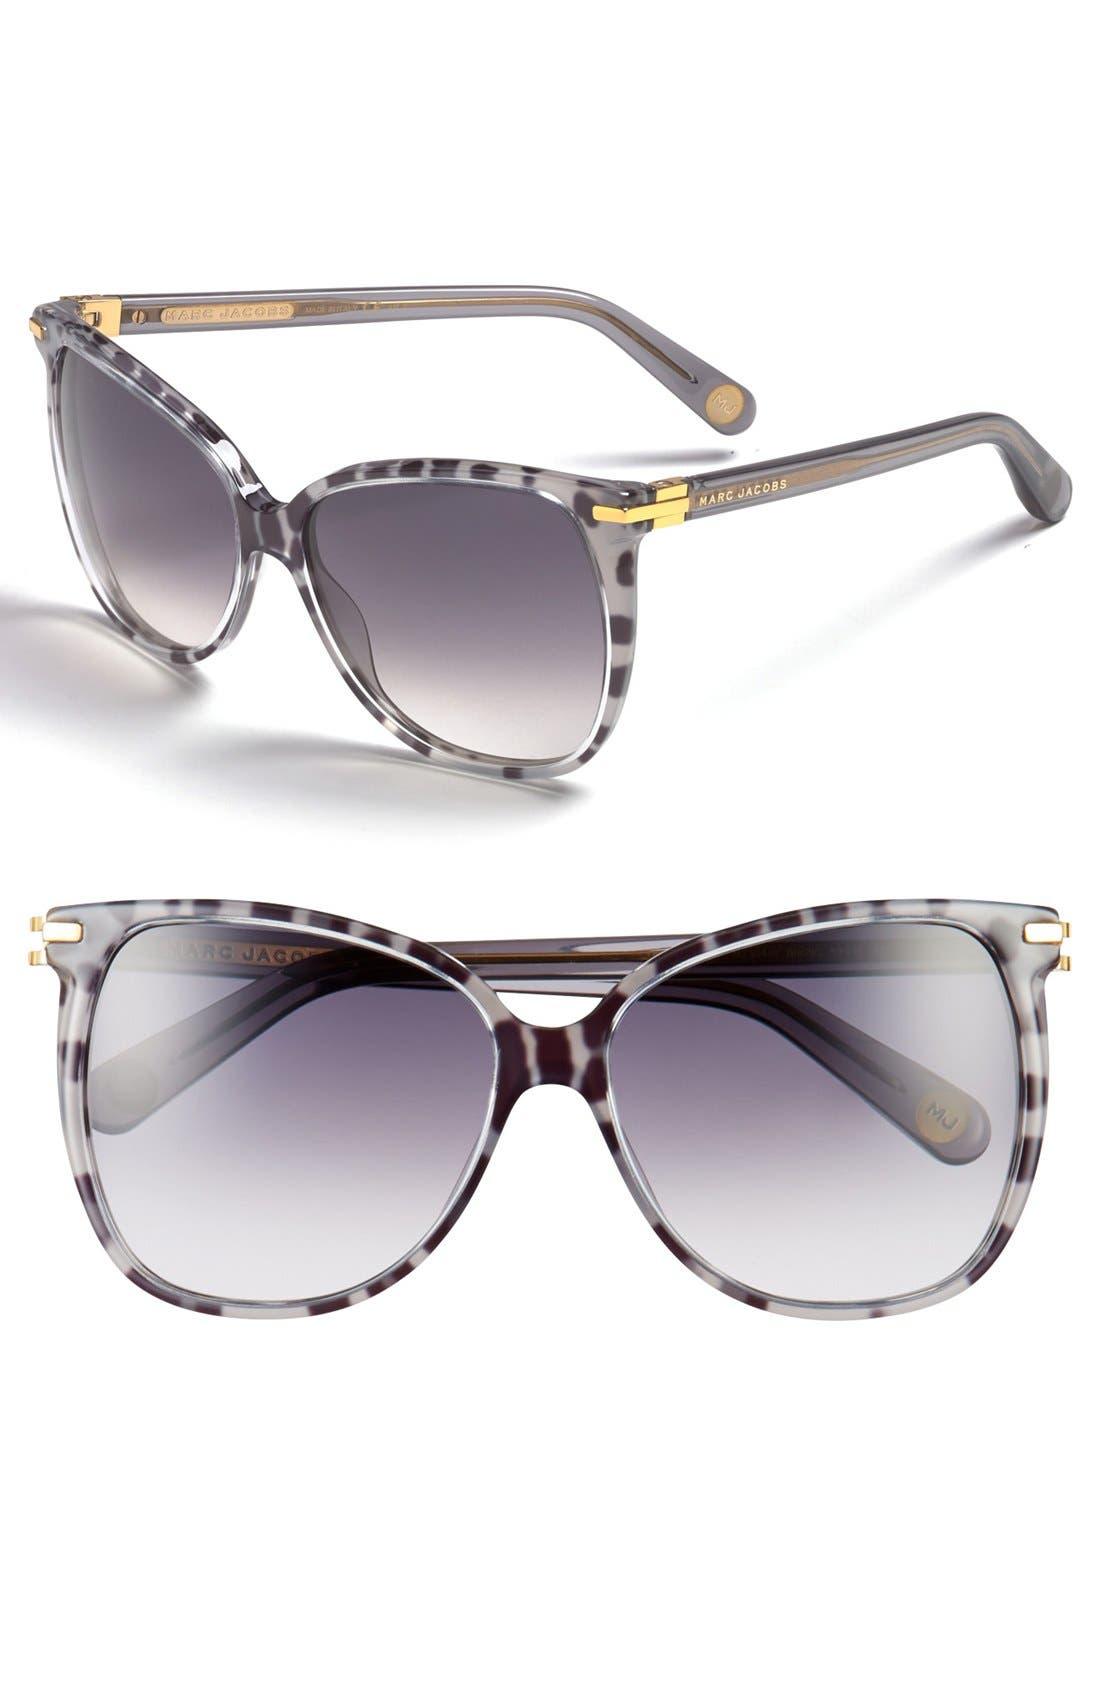 Main Image - MARC JACOBS 59mm Sunglasses